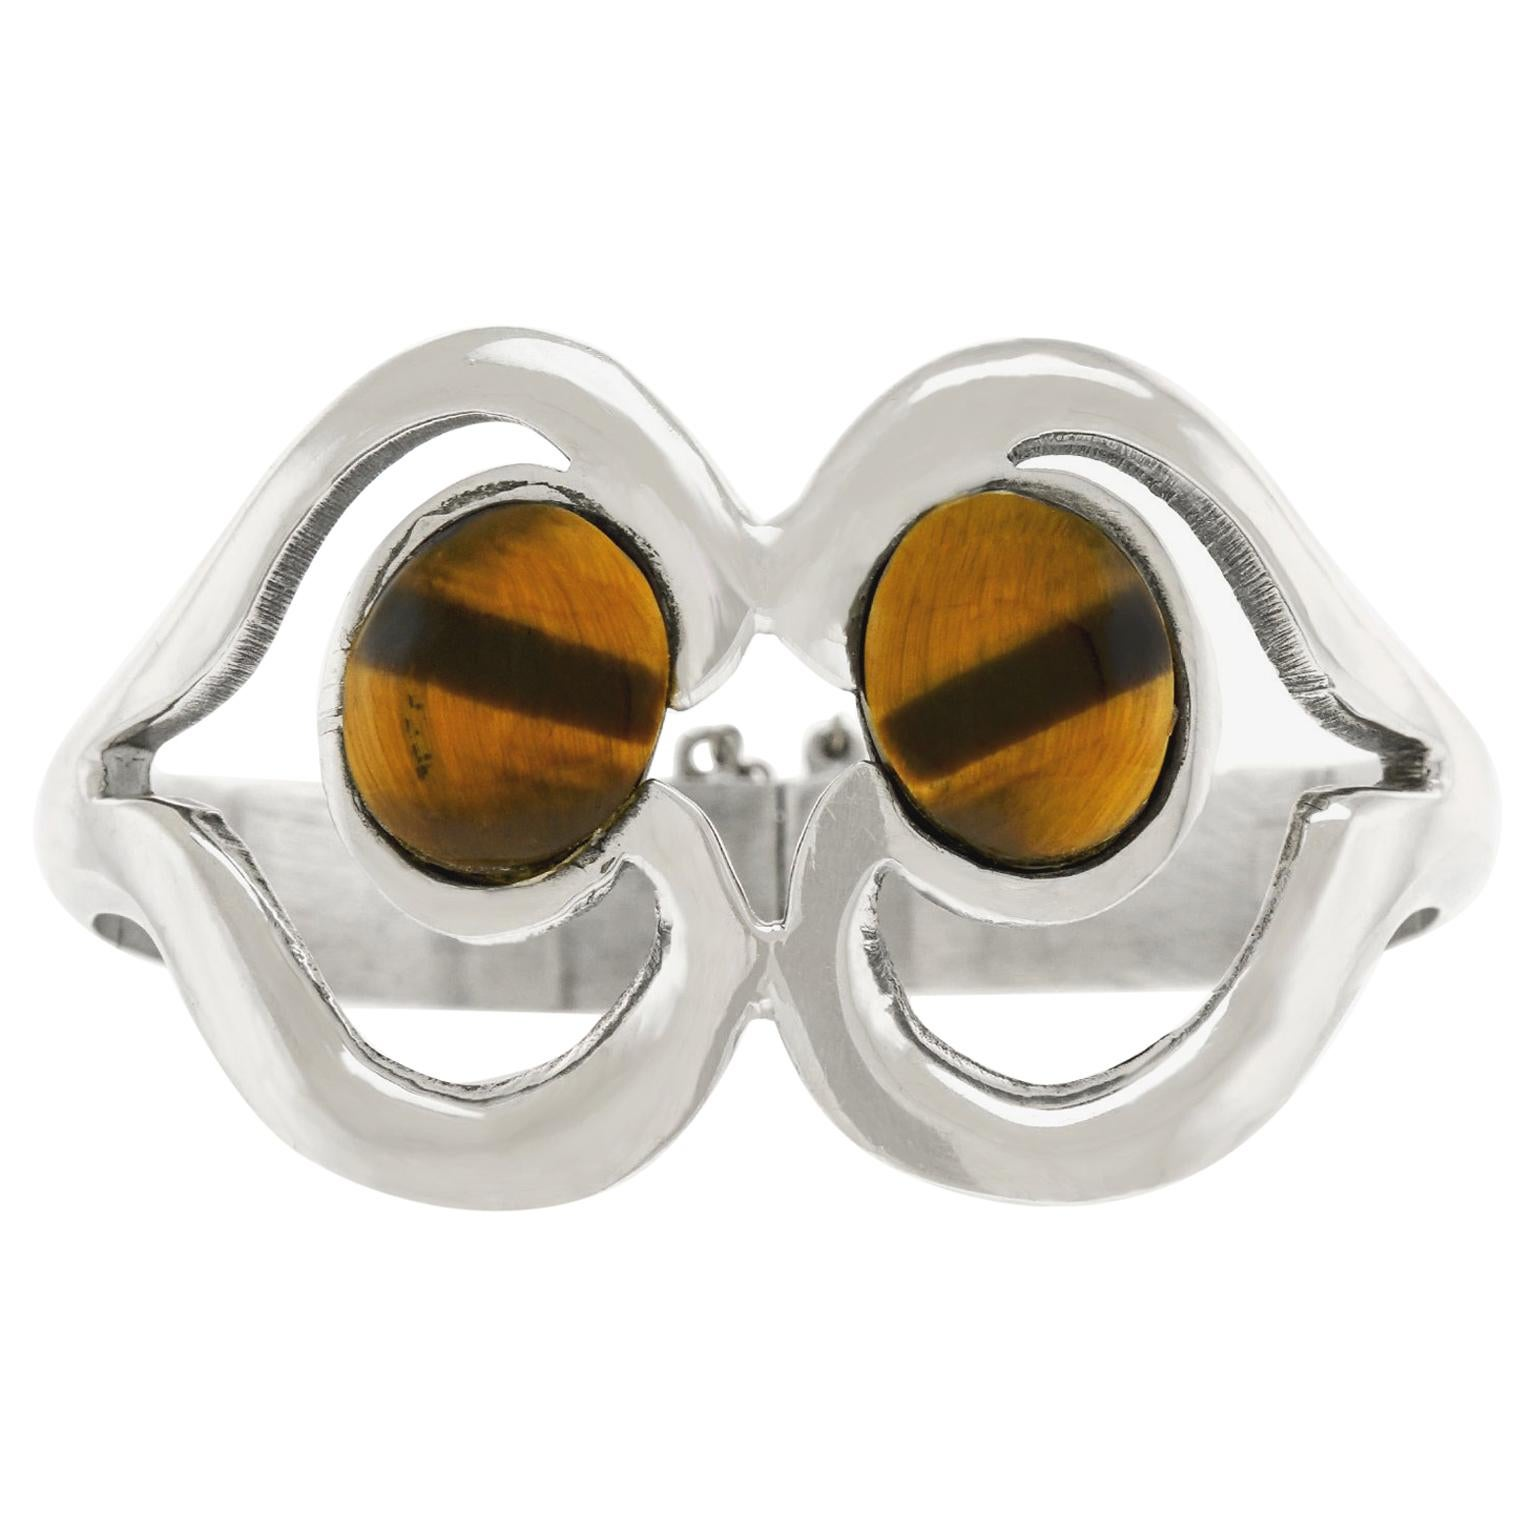 Modernist 1950s Sterling Cuff Bracelet Mexico